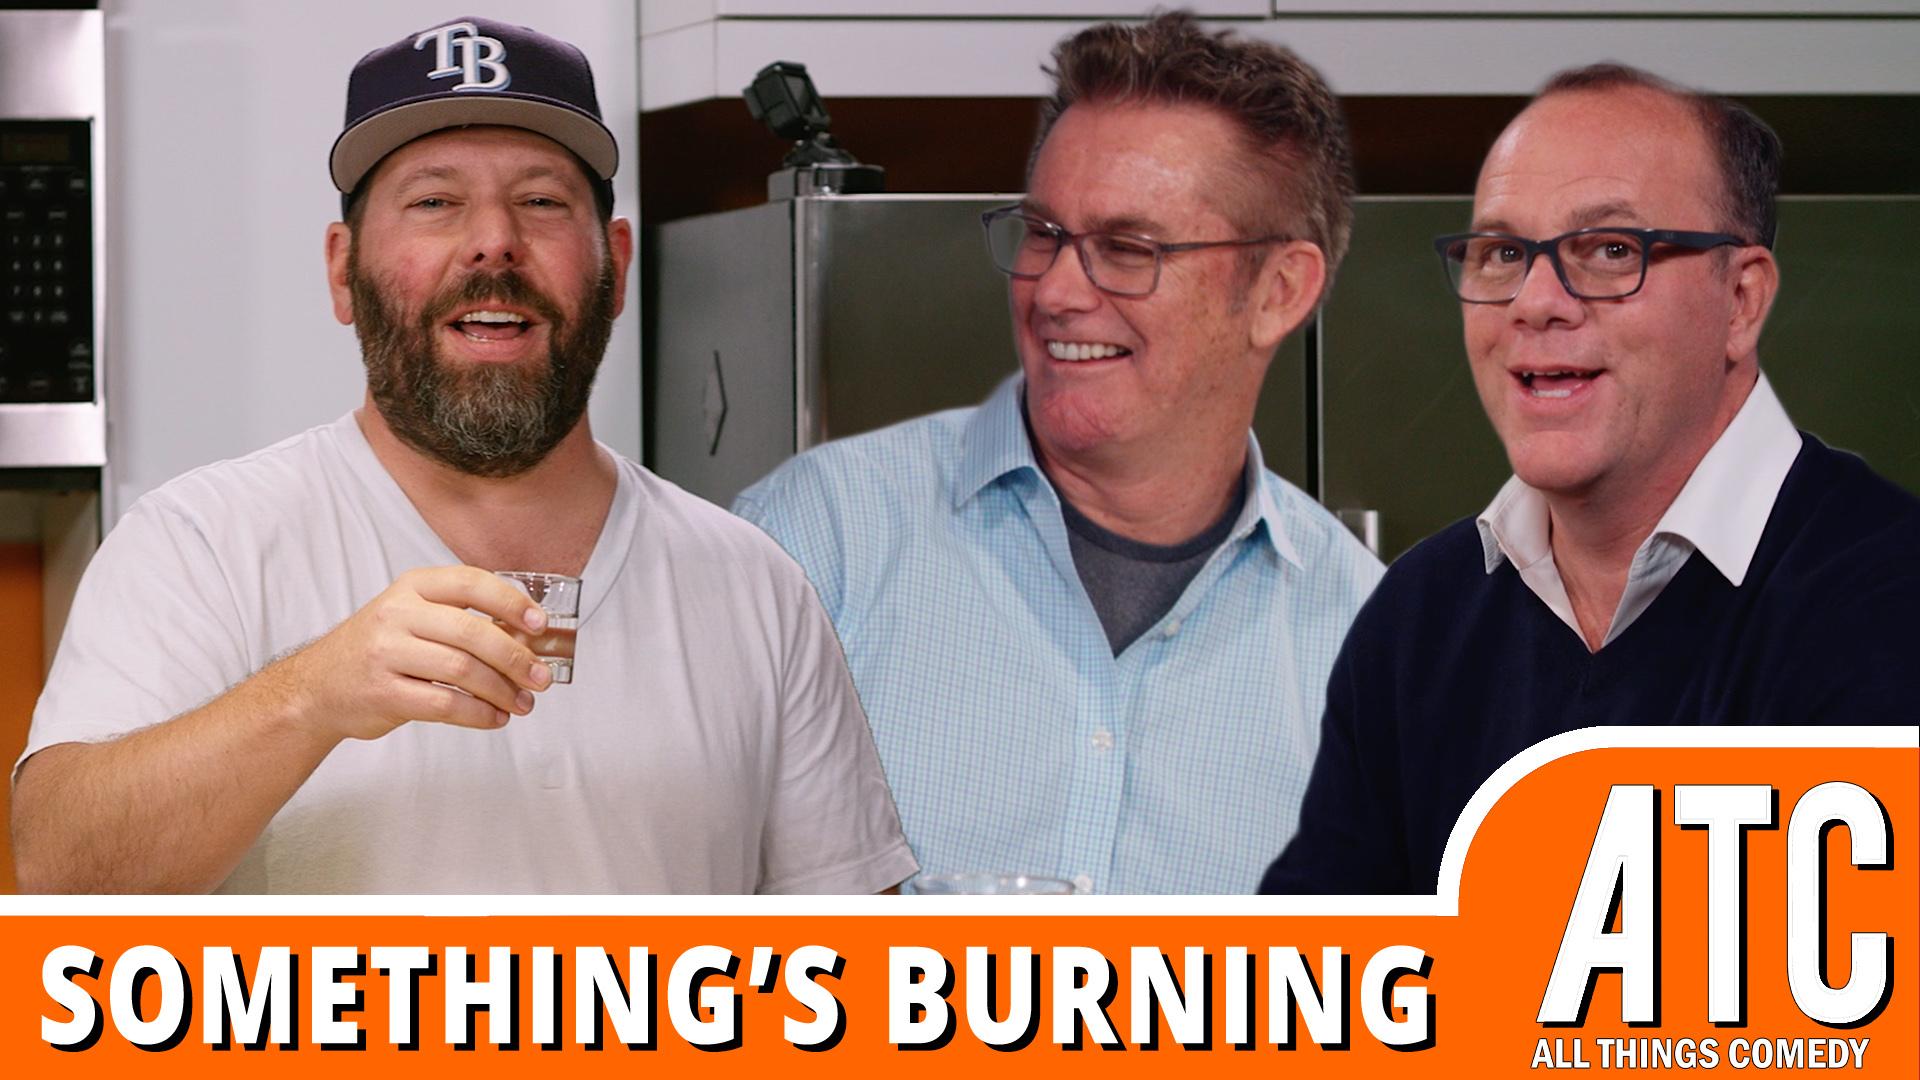 Brian Regan & Tom Papa Make Peanut Butter Brittle | Something's